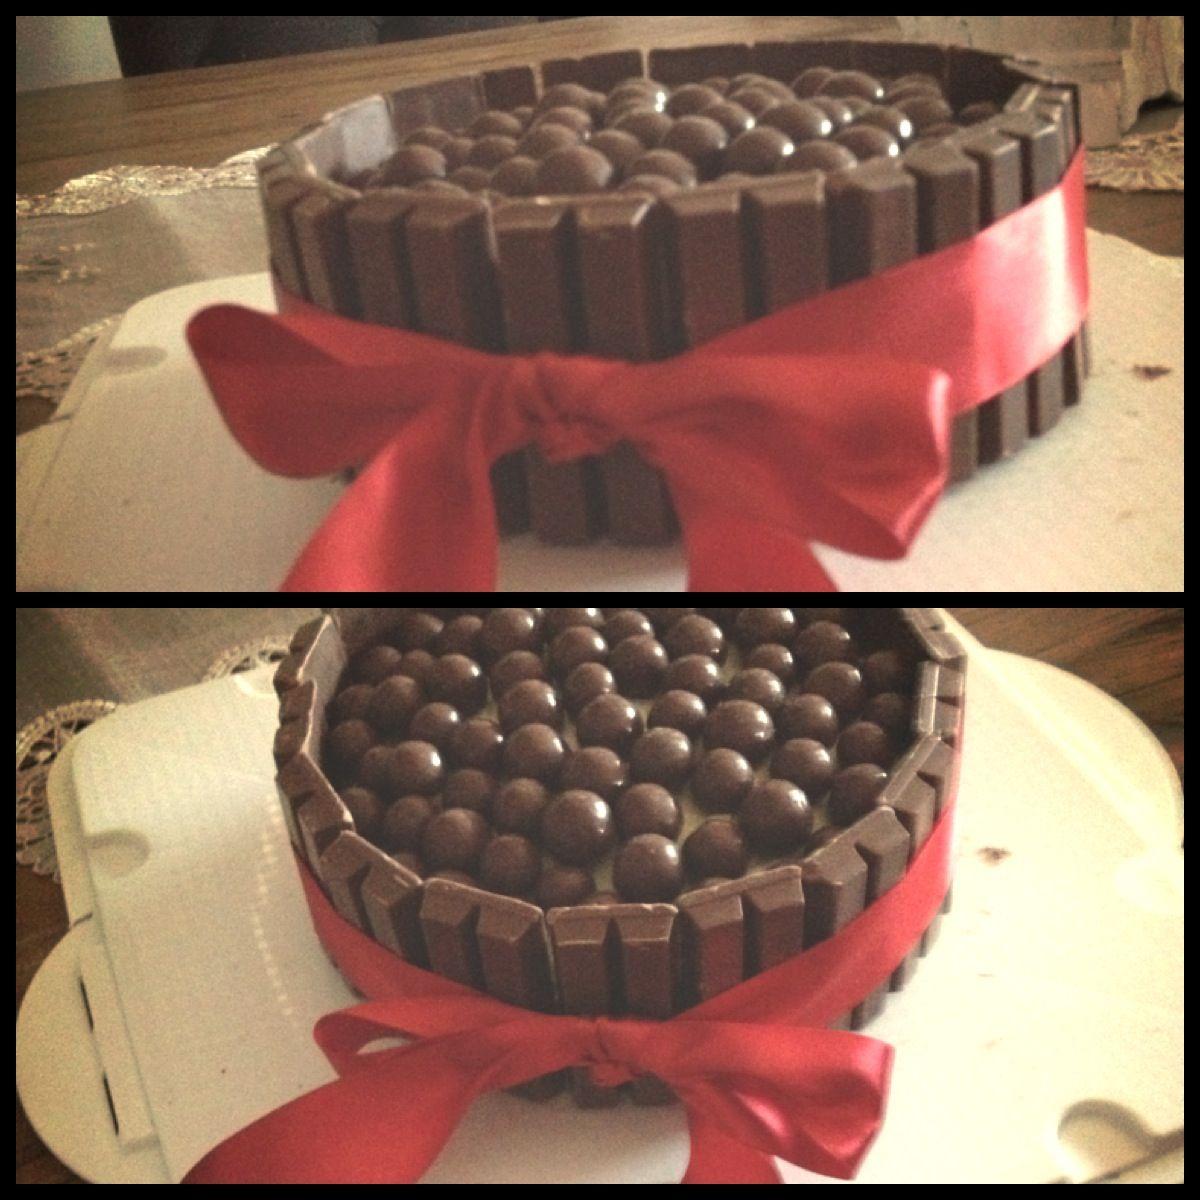 Cake Decorating Mud Cake Recipe : So easy DIY cake decorating- store bought mud cake covered ...